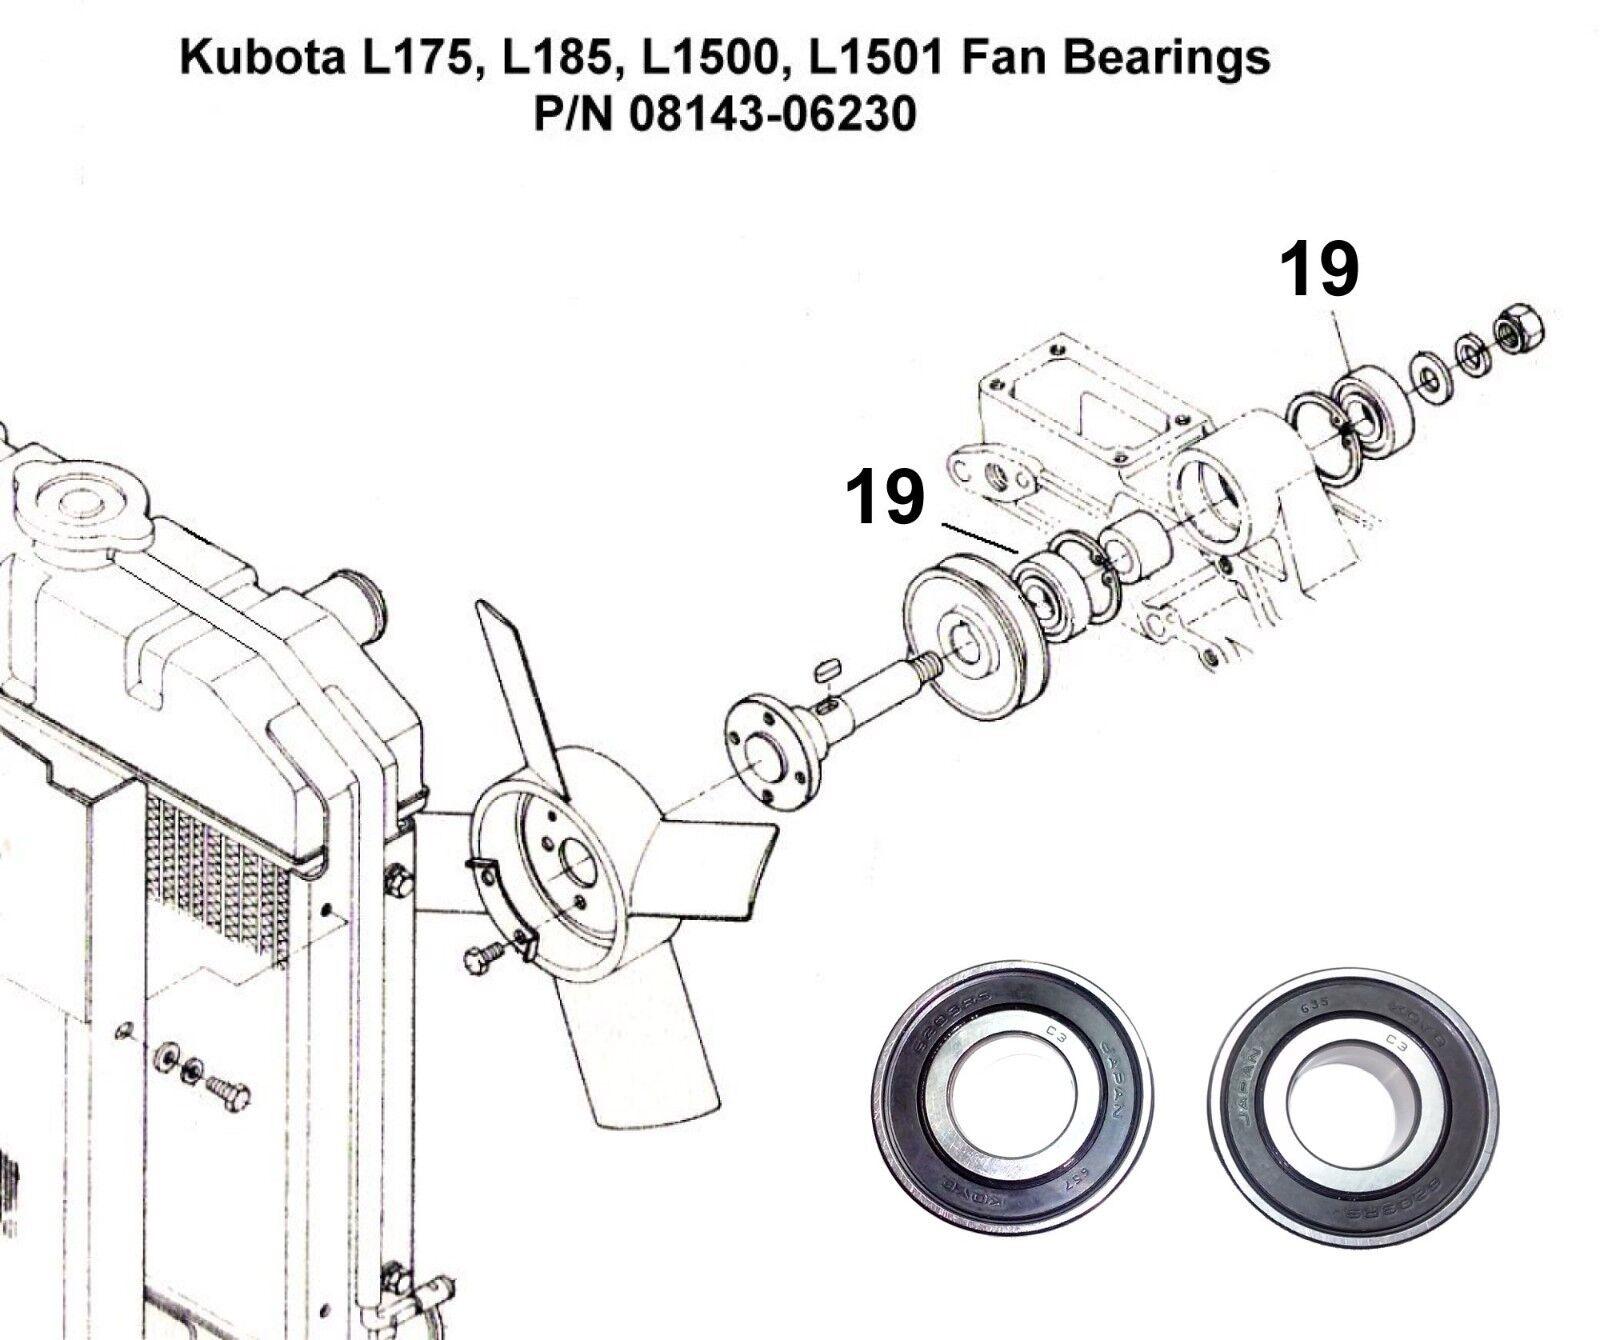 kubota l175 l185 l1500 l1501 fan bearing set 08143 06203 for salenorton secured powered by verisign